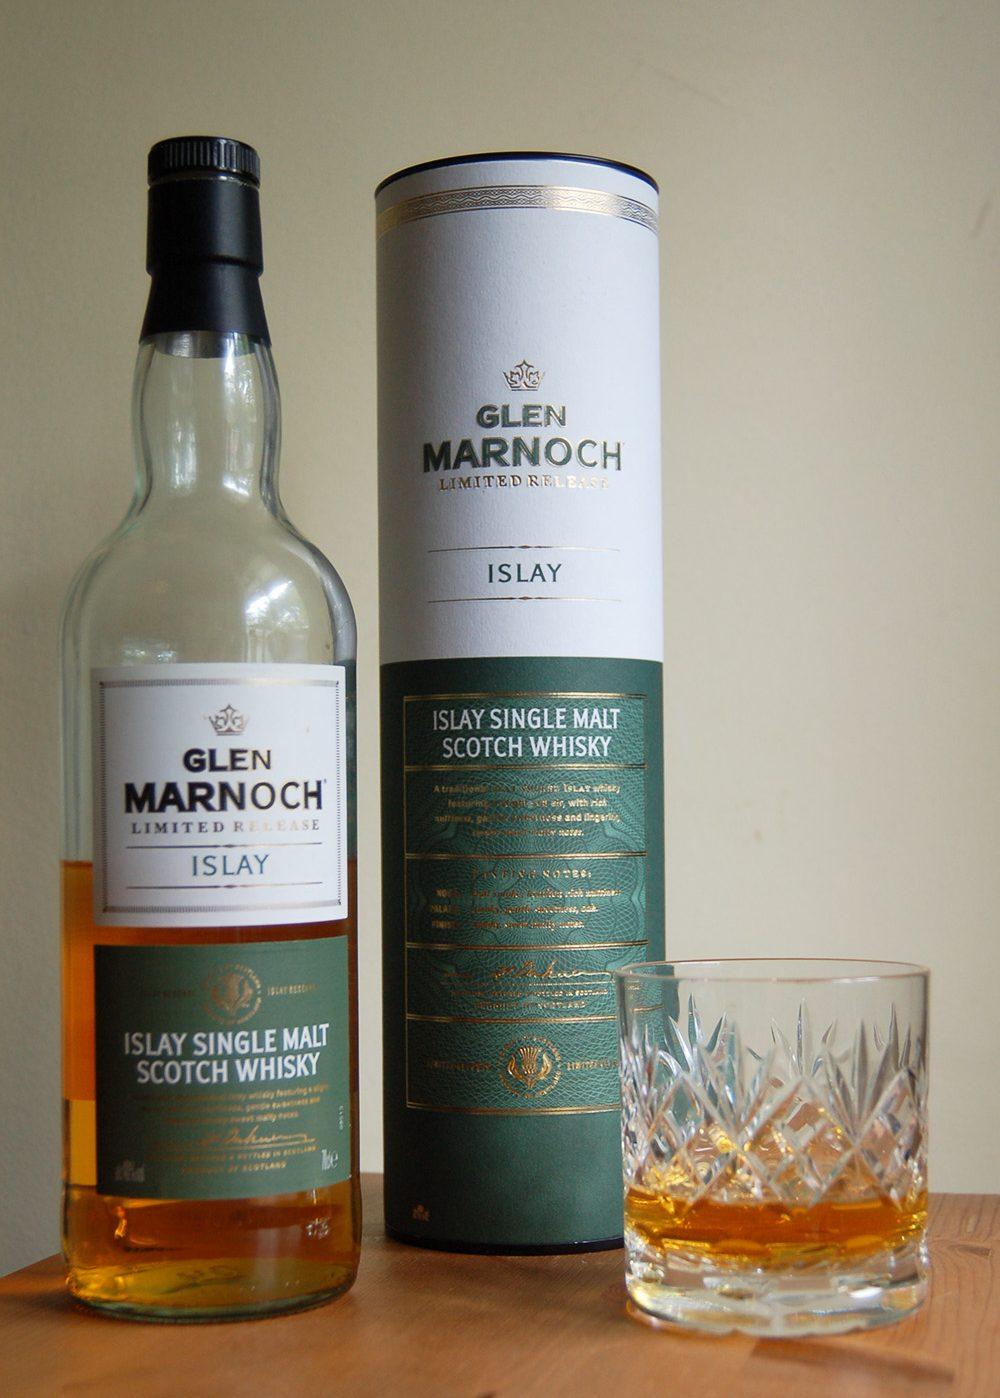 Glen Marnoch - Aldis Islay offering - Legends of Islay